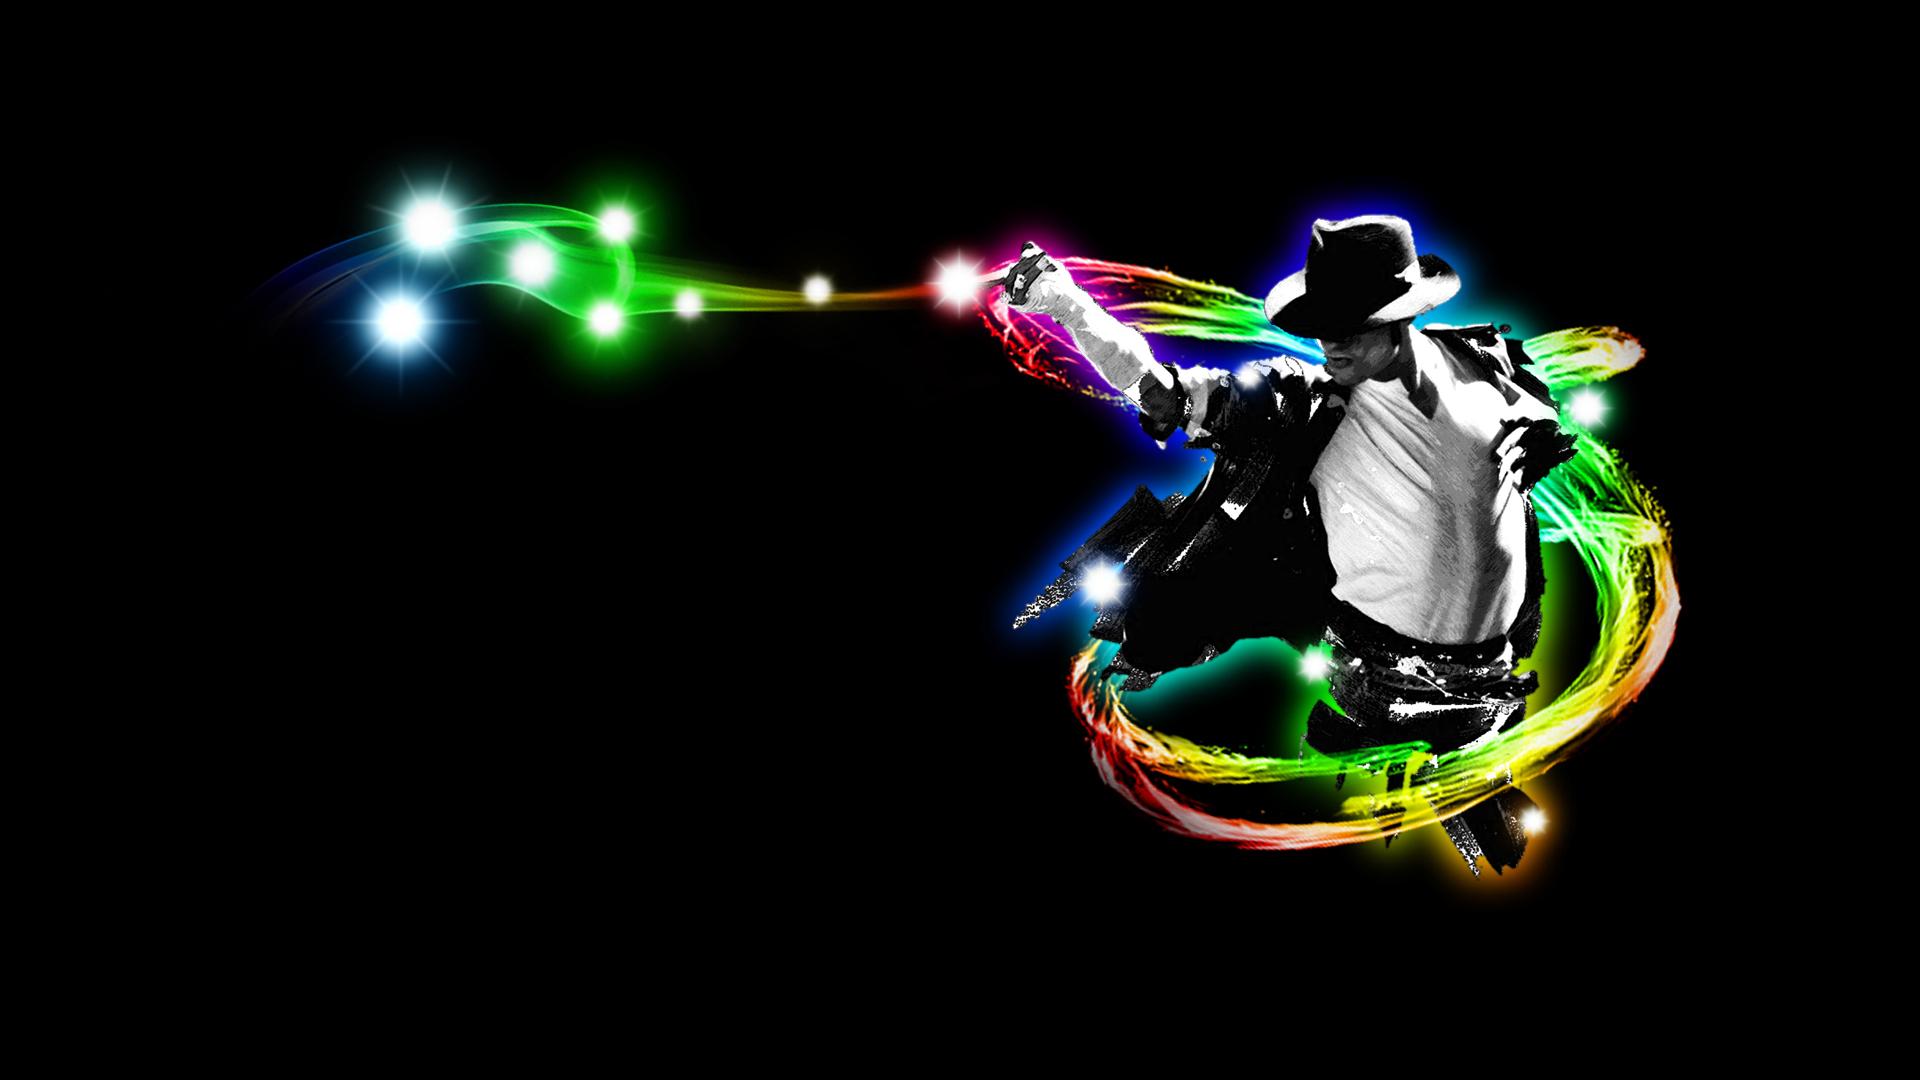 Free Widescreen Fall Wallpaper Michael Jackson Wallpaper Hd Pixelstalk Net